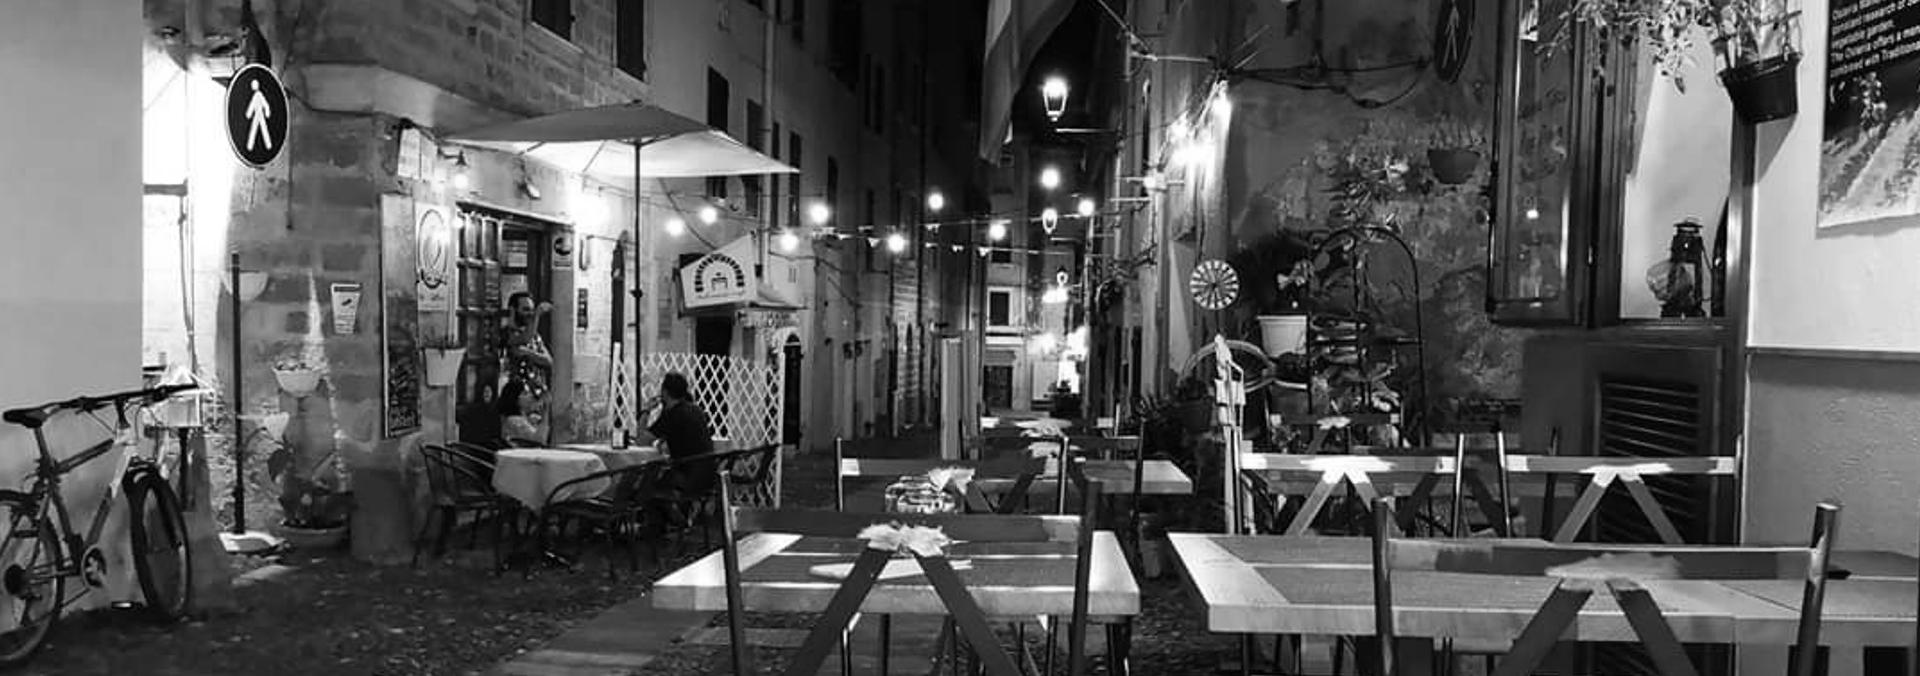 ristorante-alghero-centro-storico-bg